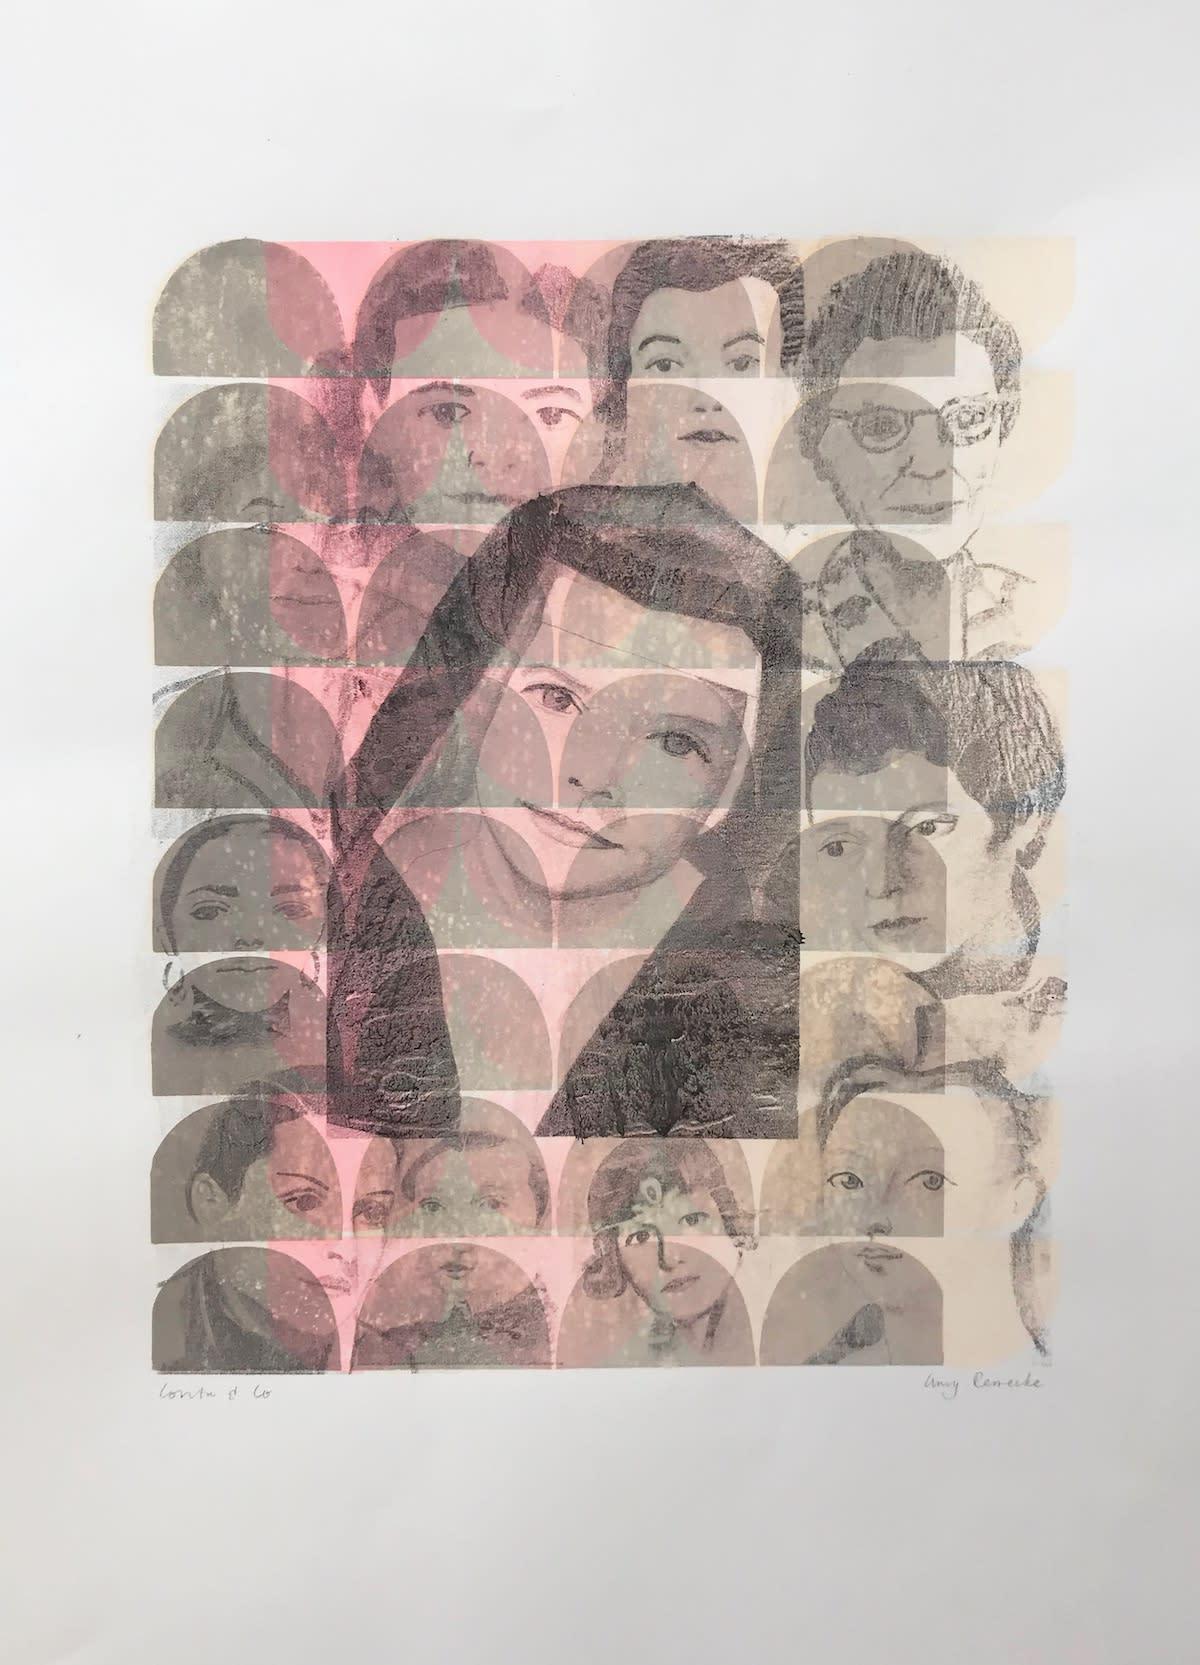 Putney School of Art and Design, Amy Reinecke, Corita & Co